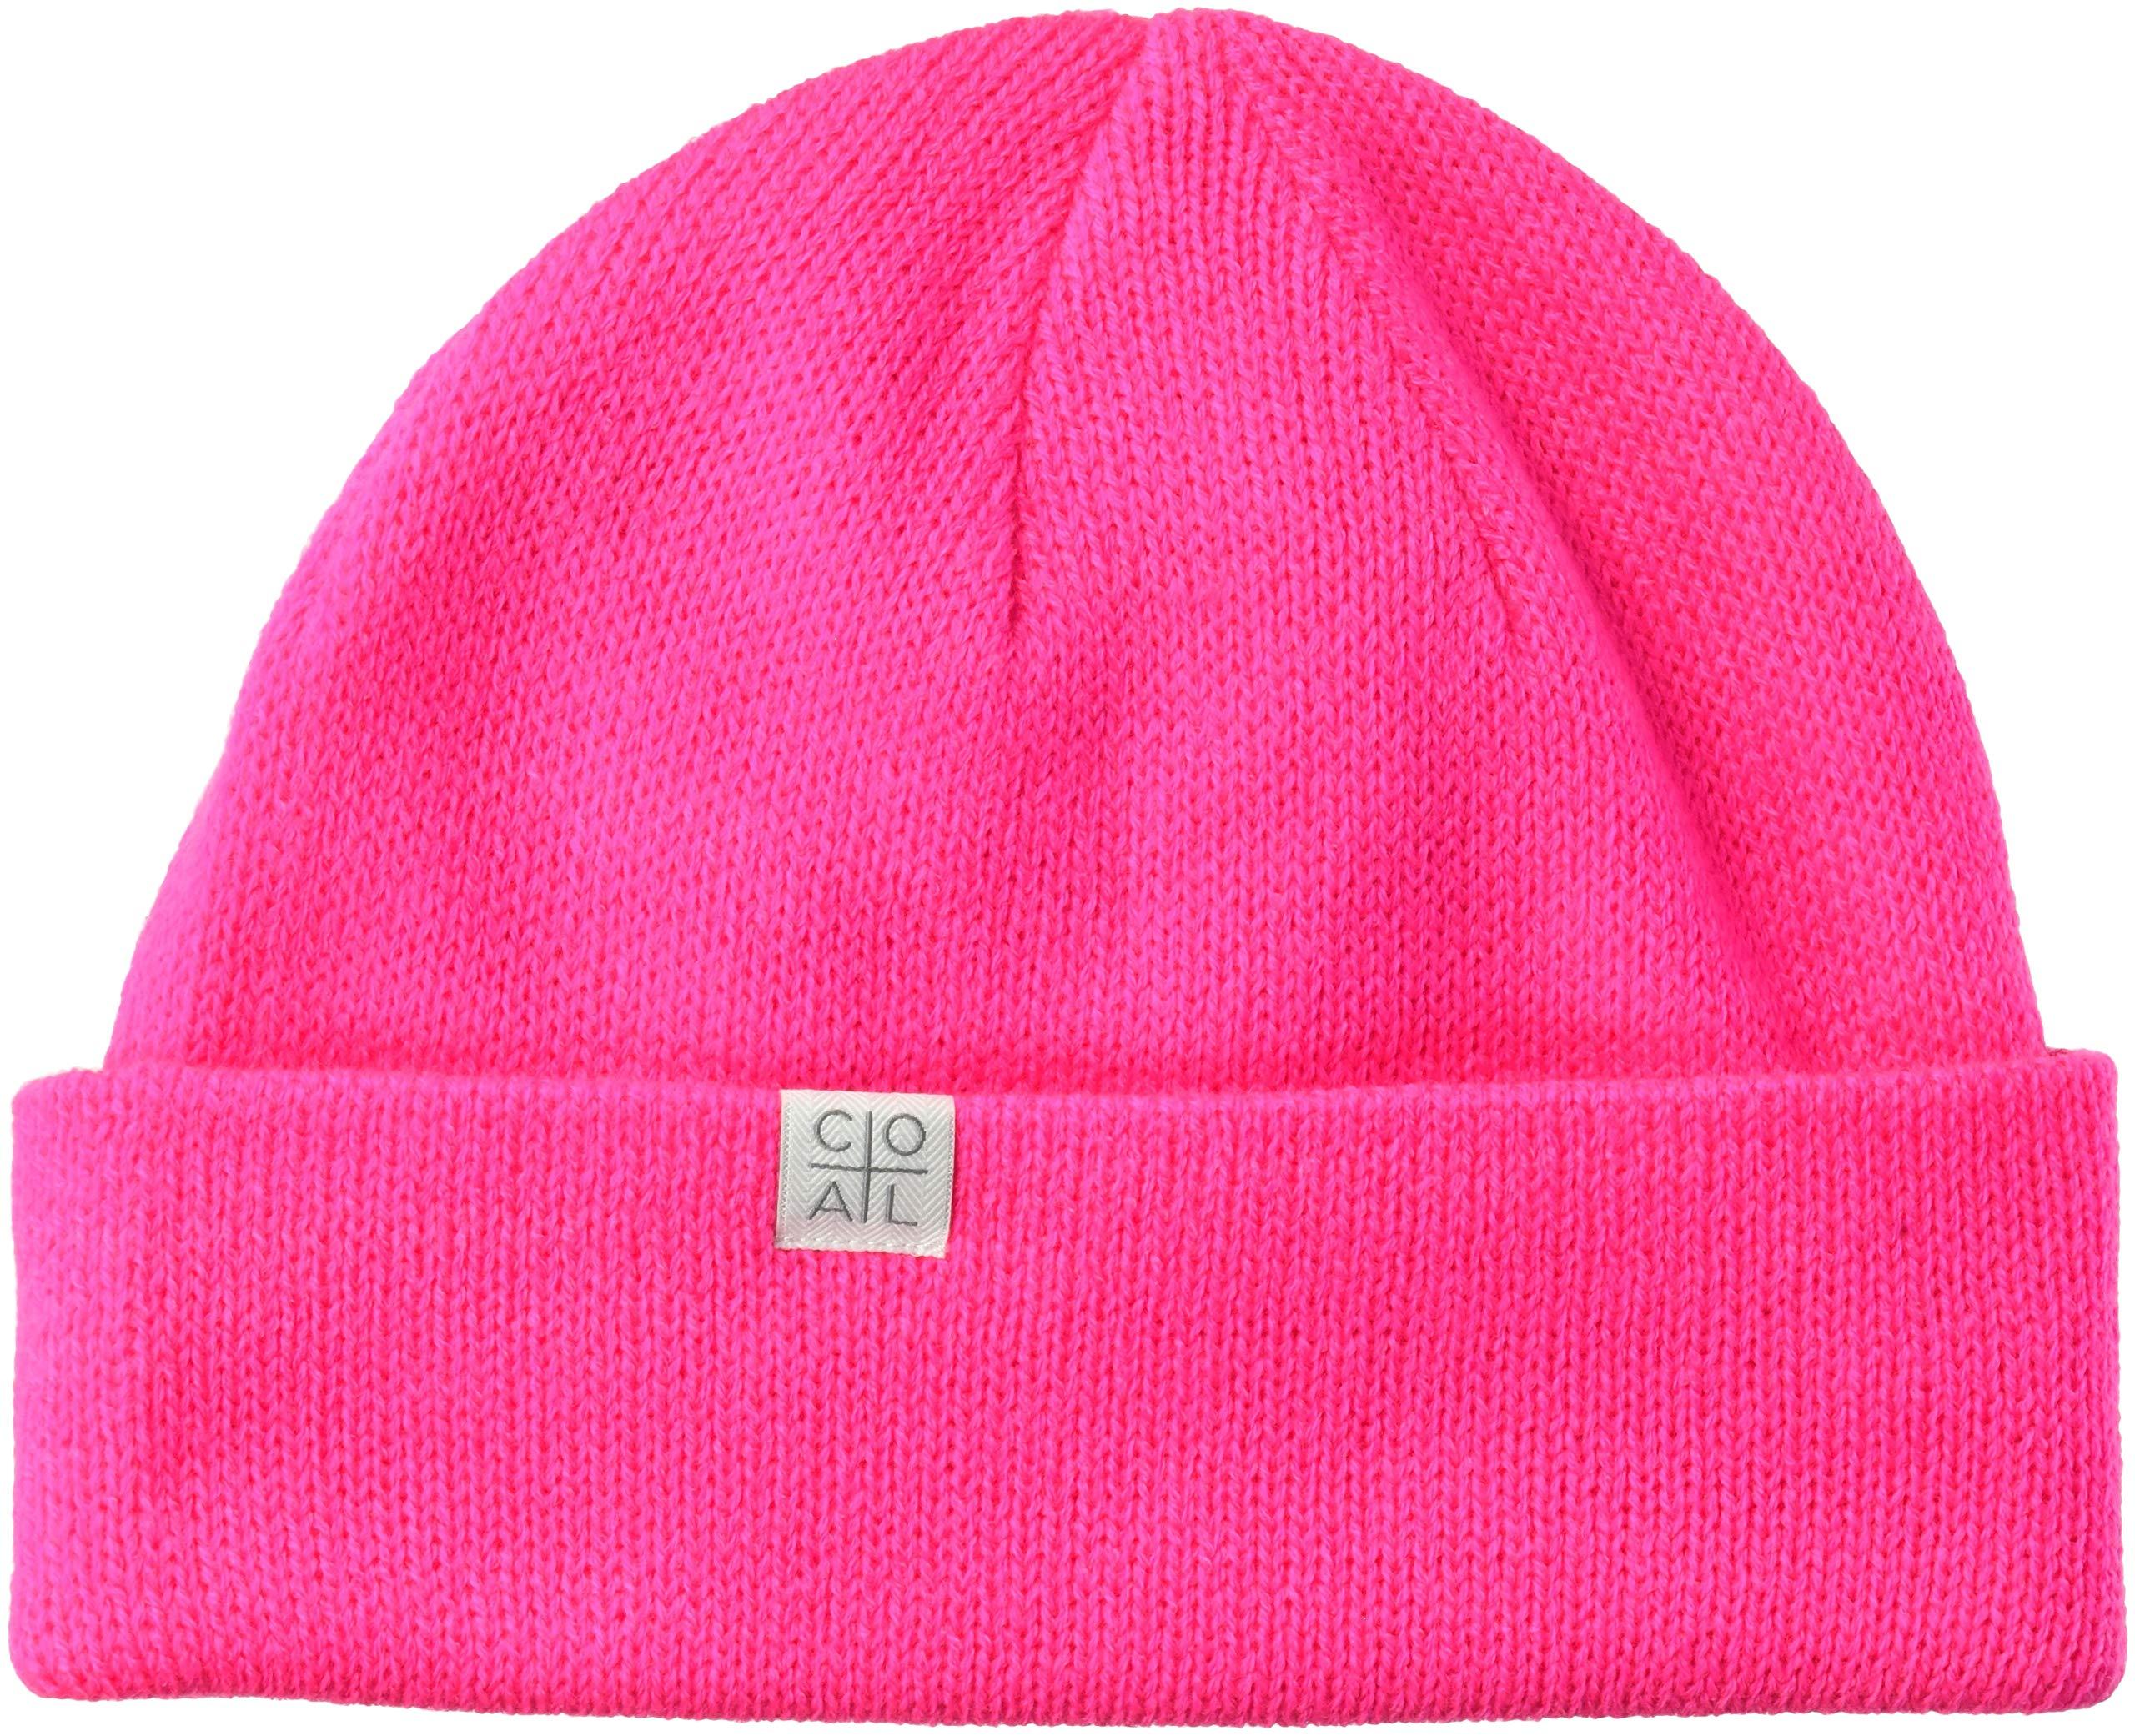 Coal Men's The FLT Fine Knit Beanie Hat, neon Pink, Slouchy/Low Profile